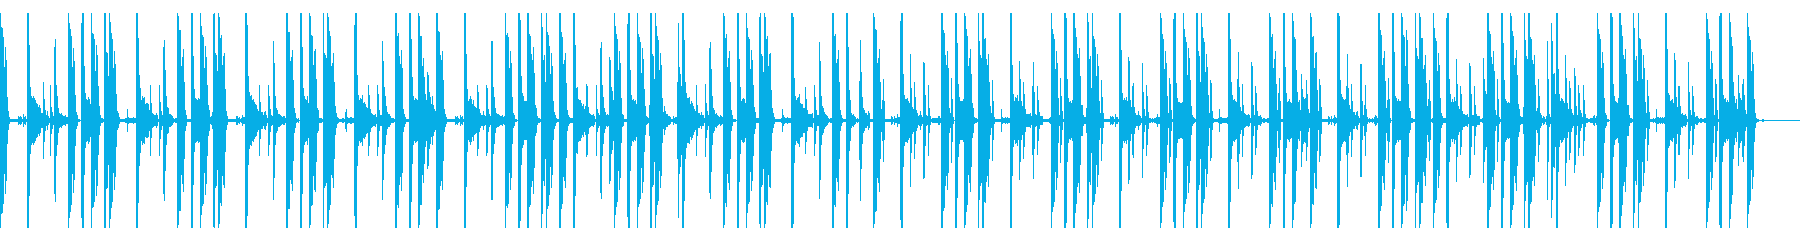 123 BPMの再生済みの波形